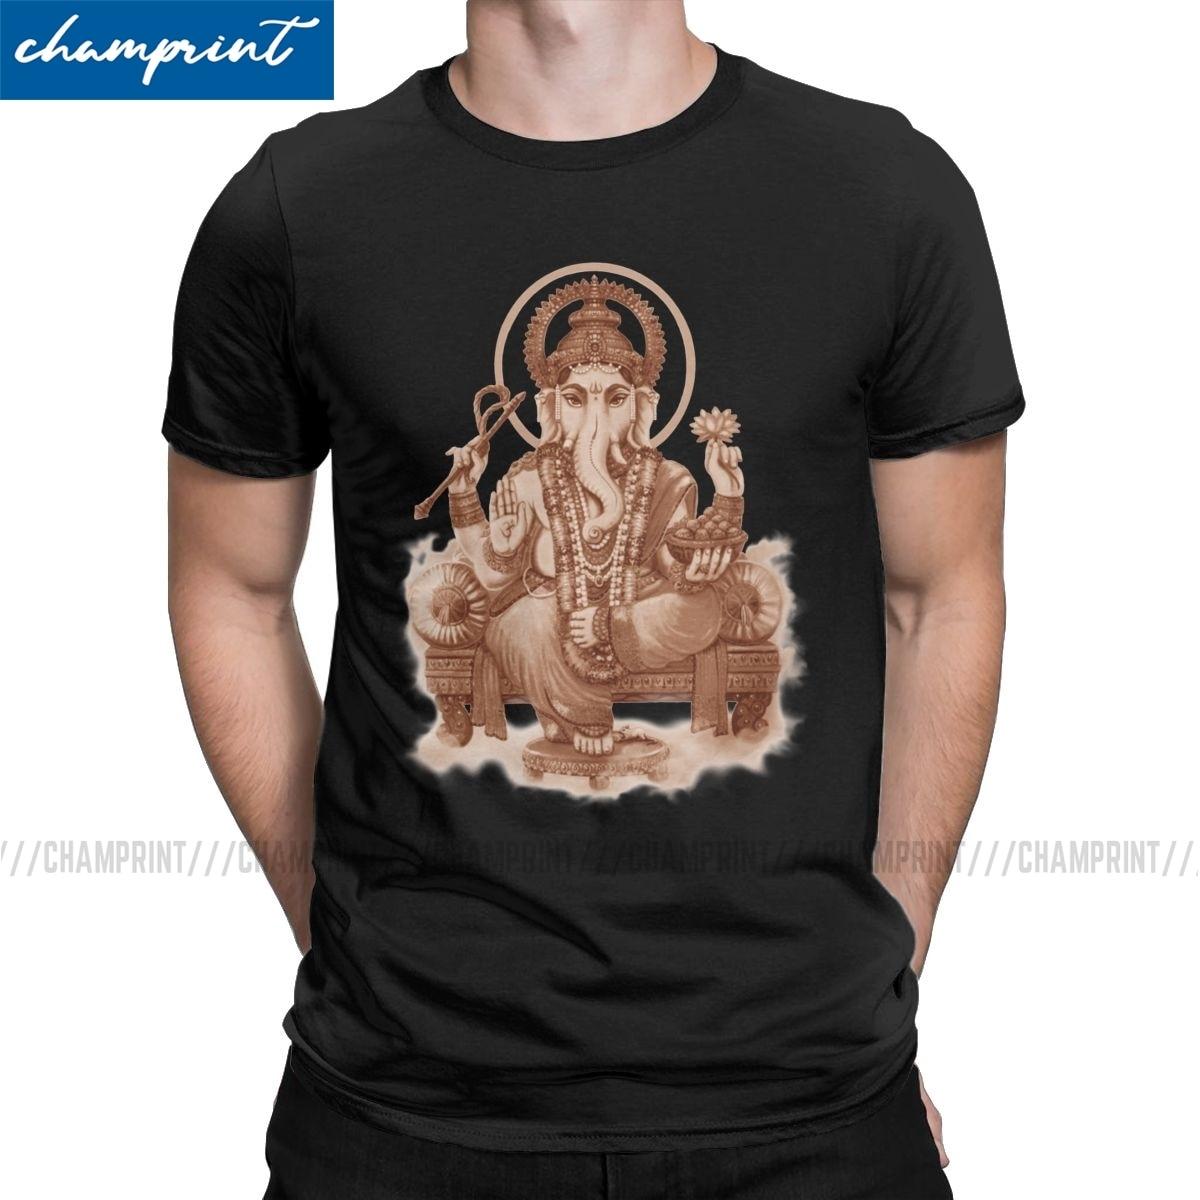 Ganesha The Remover Of All Obstacles T Shirt Men Novelty T-Shirts Shiva Lingam God India Hindu Tees Short Sleeve Clothing 6XL